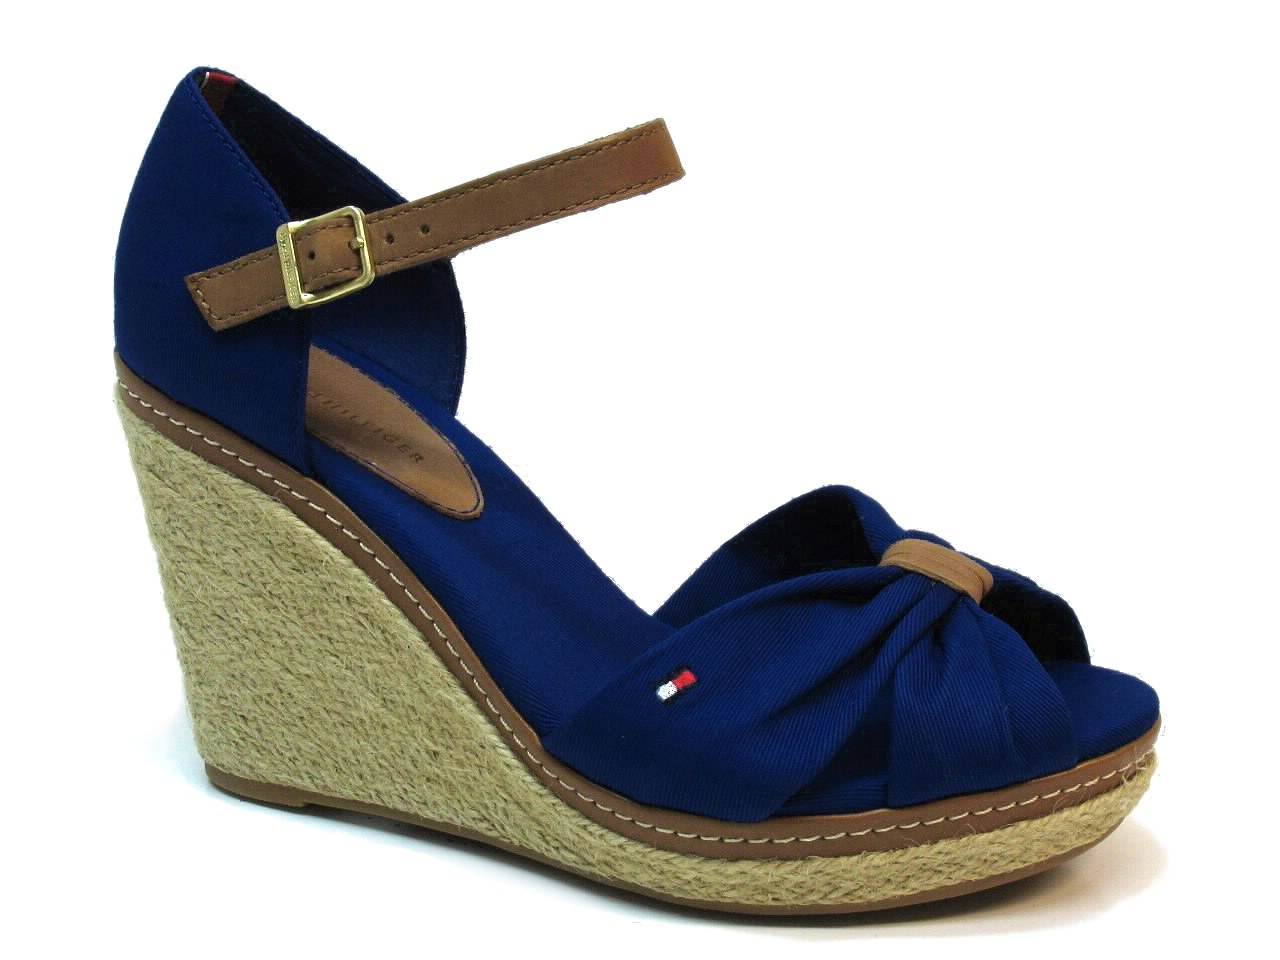 Wedge Sandals Tommy Hilfiger - 309 15443